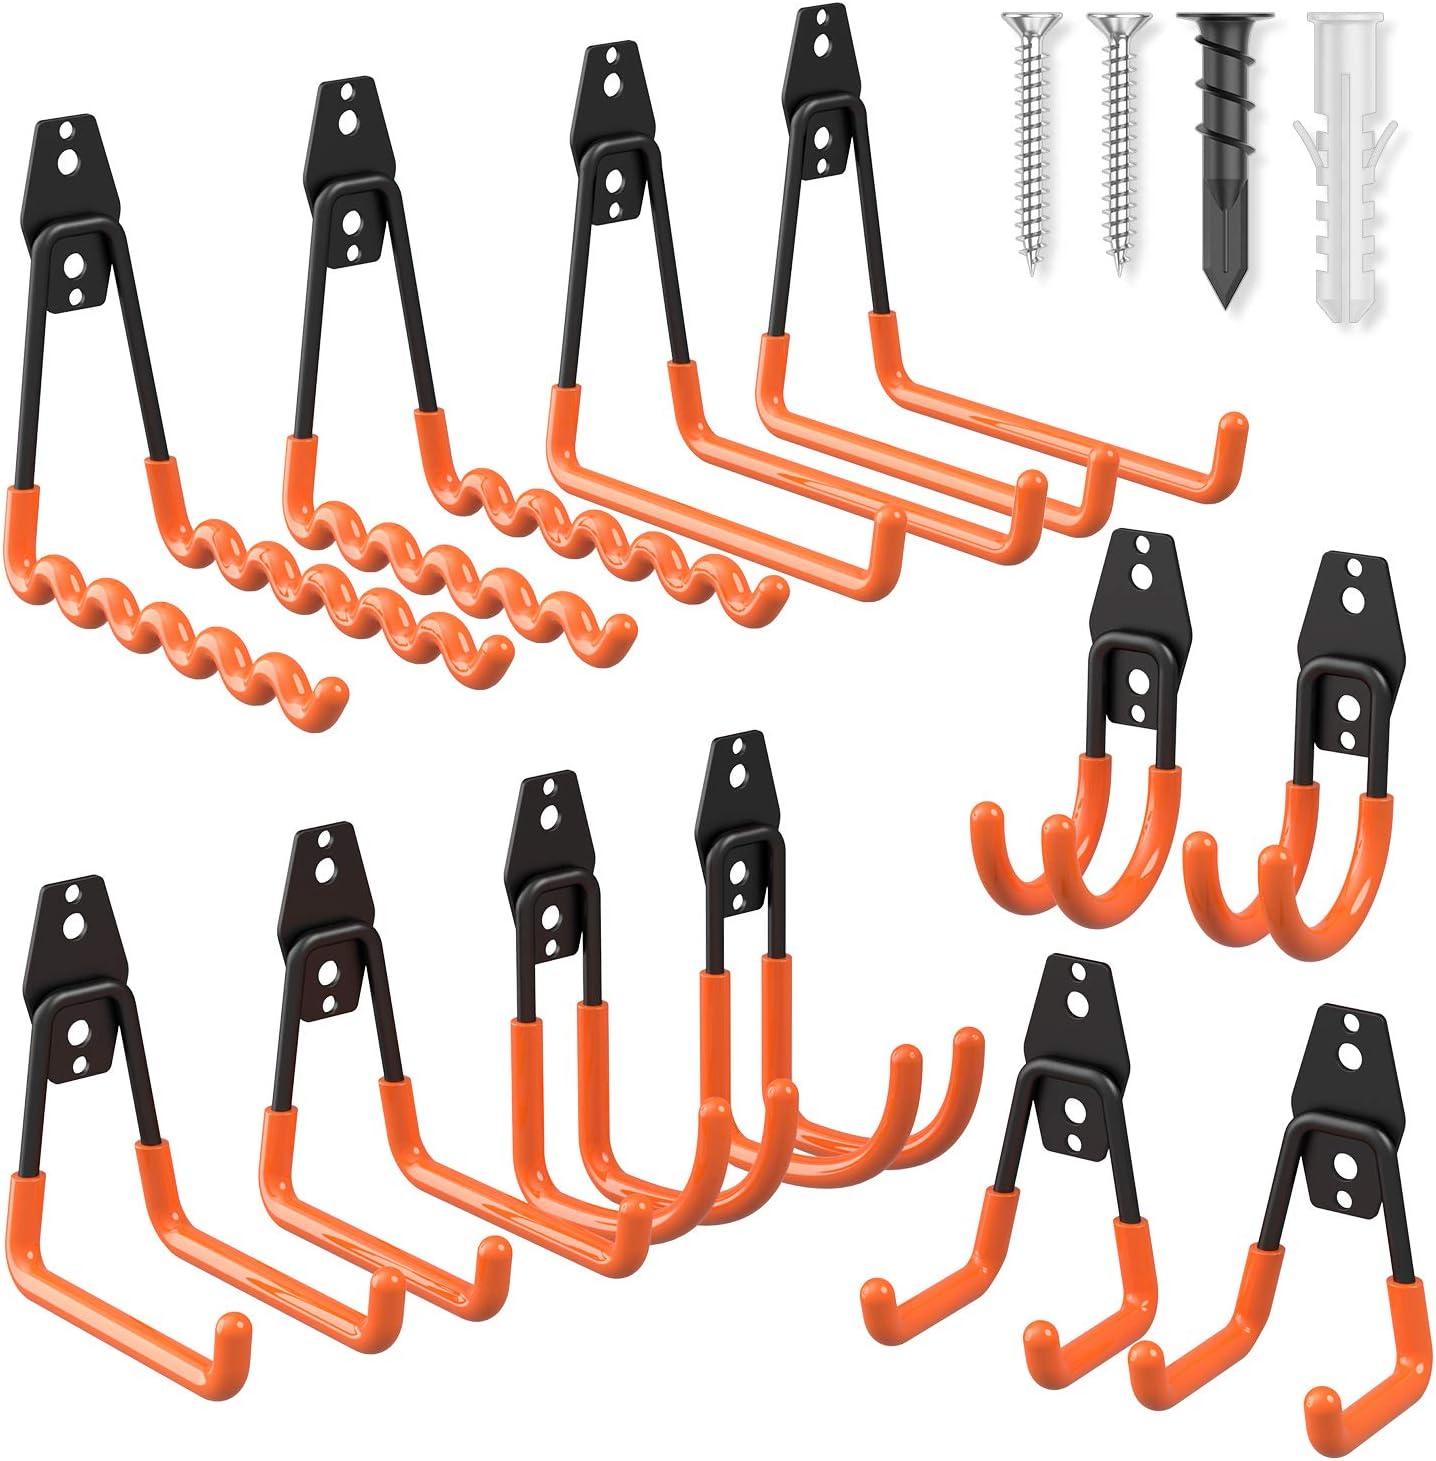 Garage Hooks Heavy Duty 12 Pack, Esky Steel Garage Storage Hooks, Tool Hangers for Garage Wall Utility Wall Mount Garage Hooks and Hangers with Anti-Slip Coating for Garden Tools, Ladders, Bulky Items